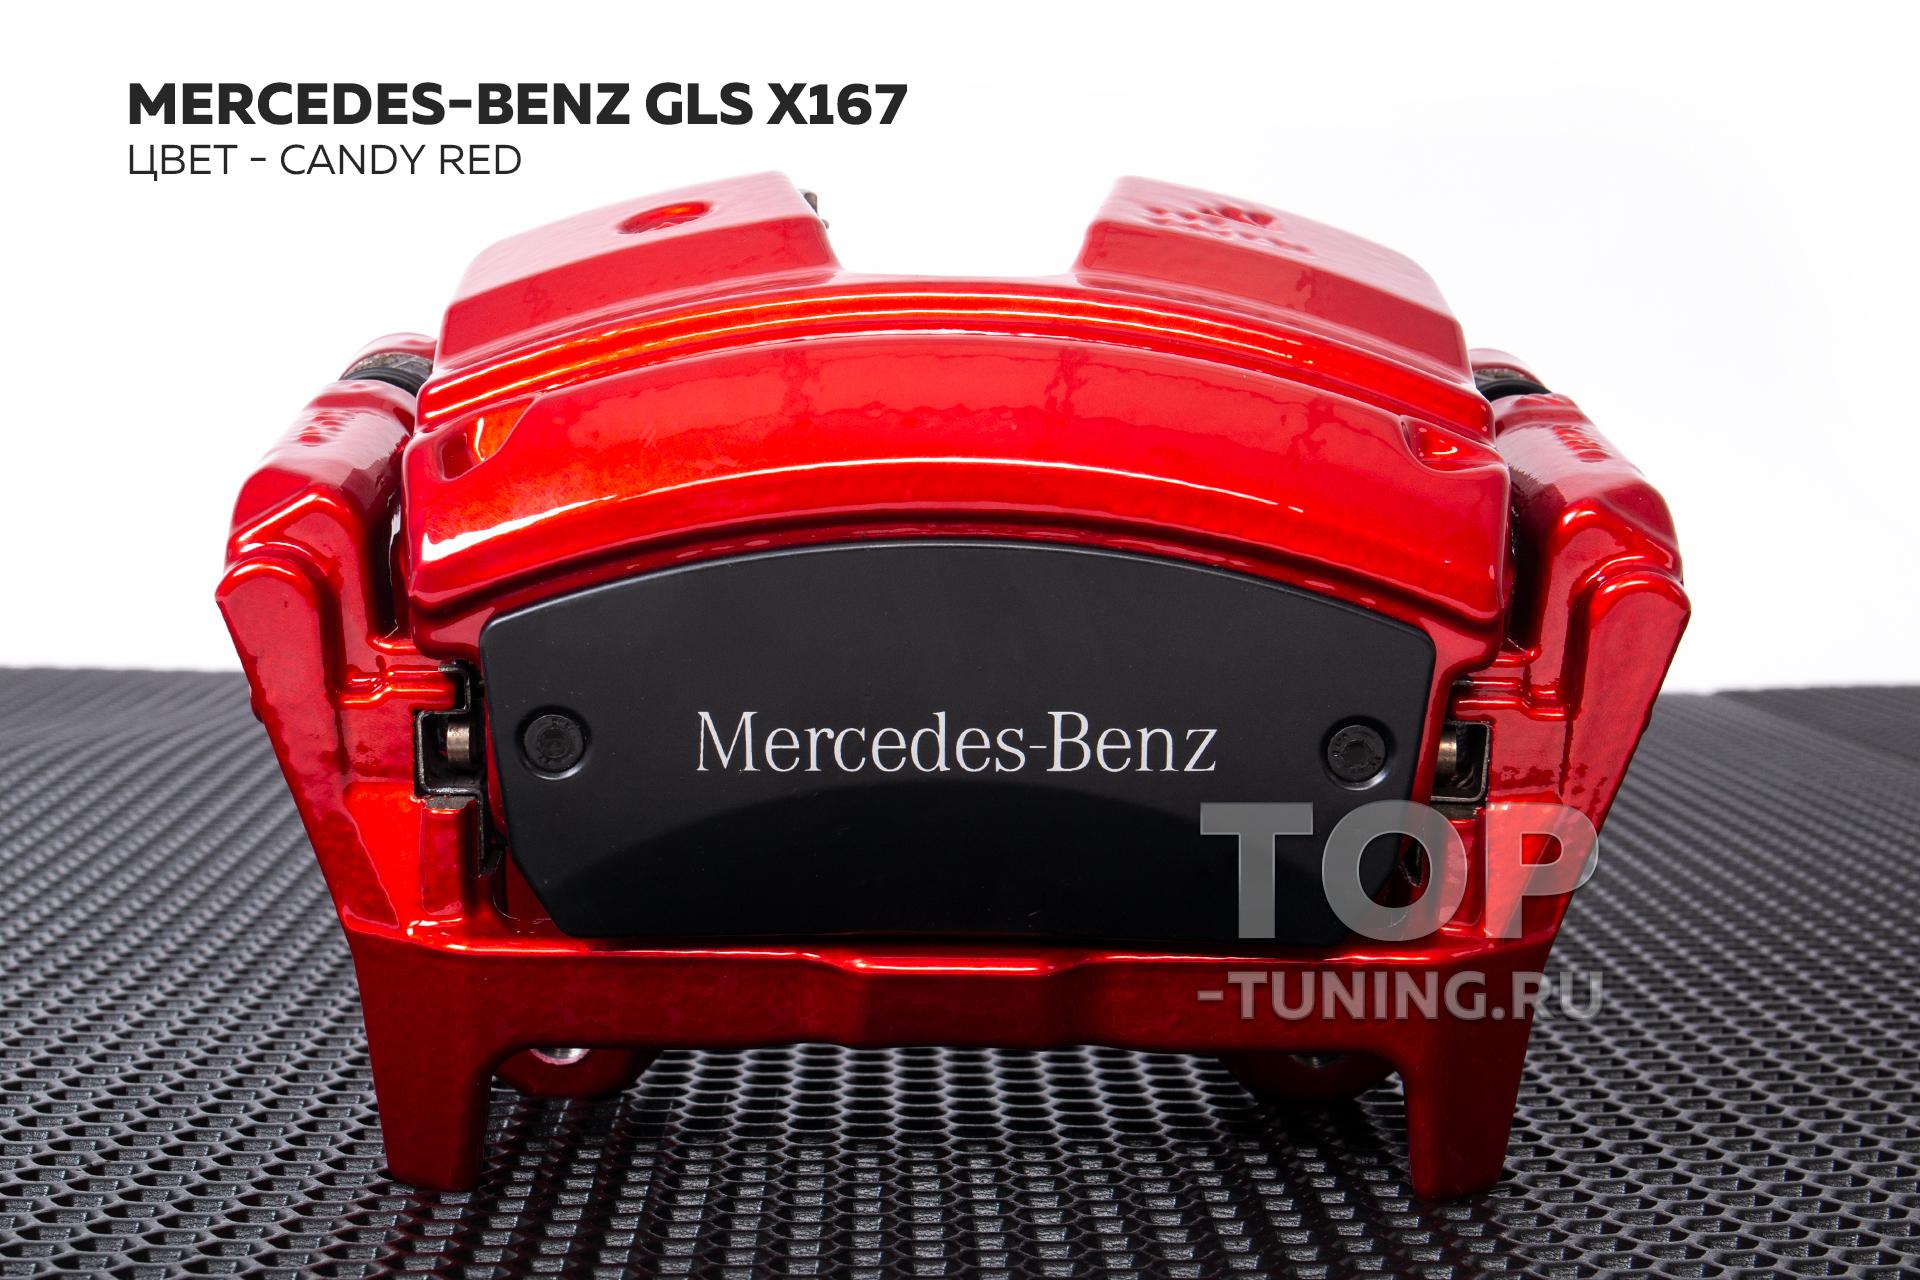 Пример работ Топ Тюнинг - окраска суппортов Мерседес ГЛС 167 - цвет Candy Red